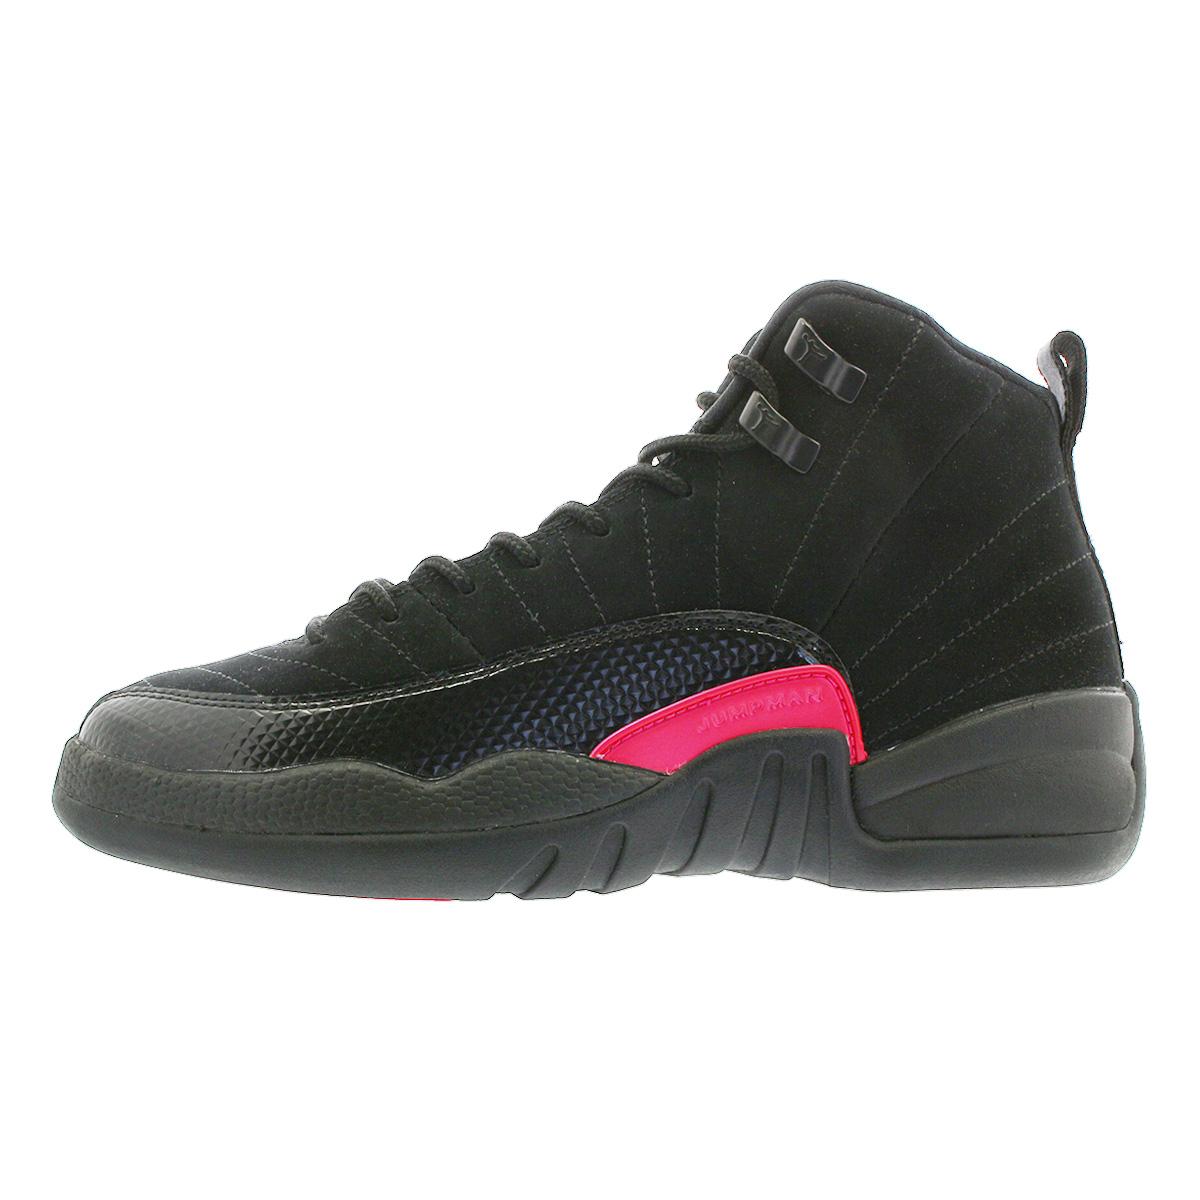 85d4a4ce42d7 NIKE AIR JORDAN 12 RETRO GG Nike Air Jordan 12 nostalgic GG BLACK DARK GREY  RUSH PINK 510